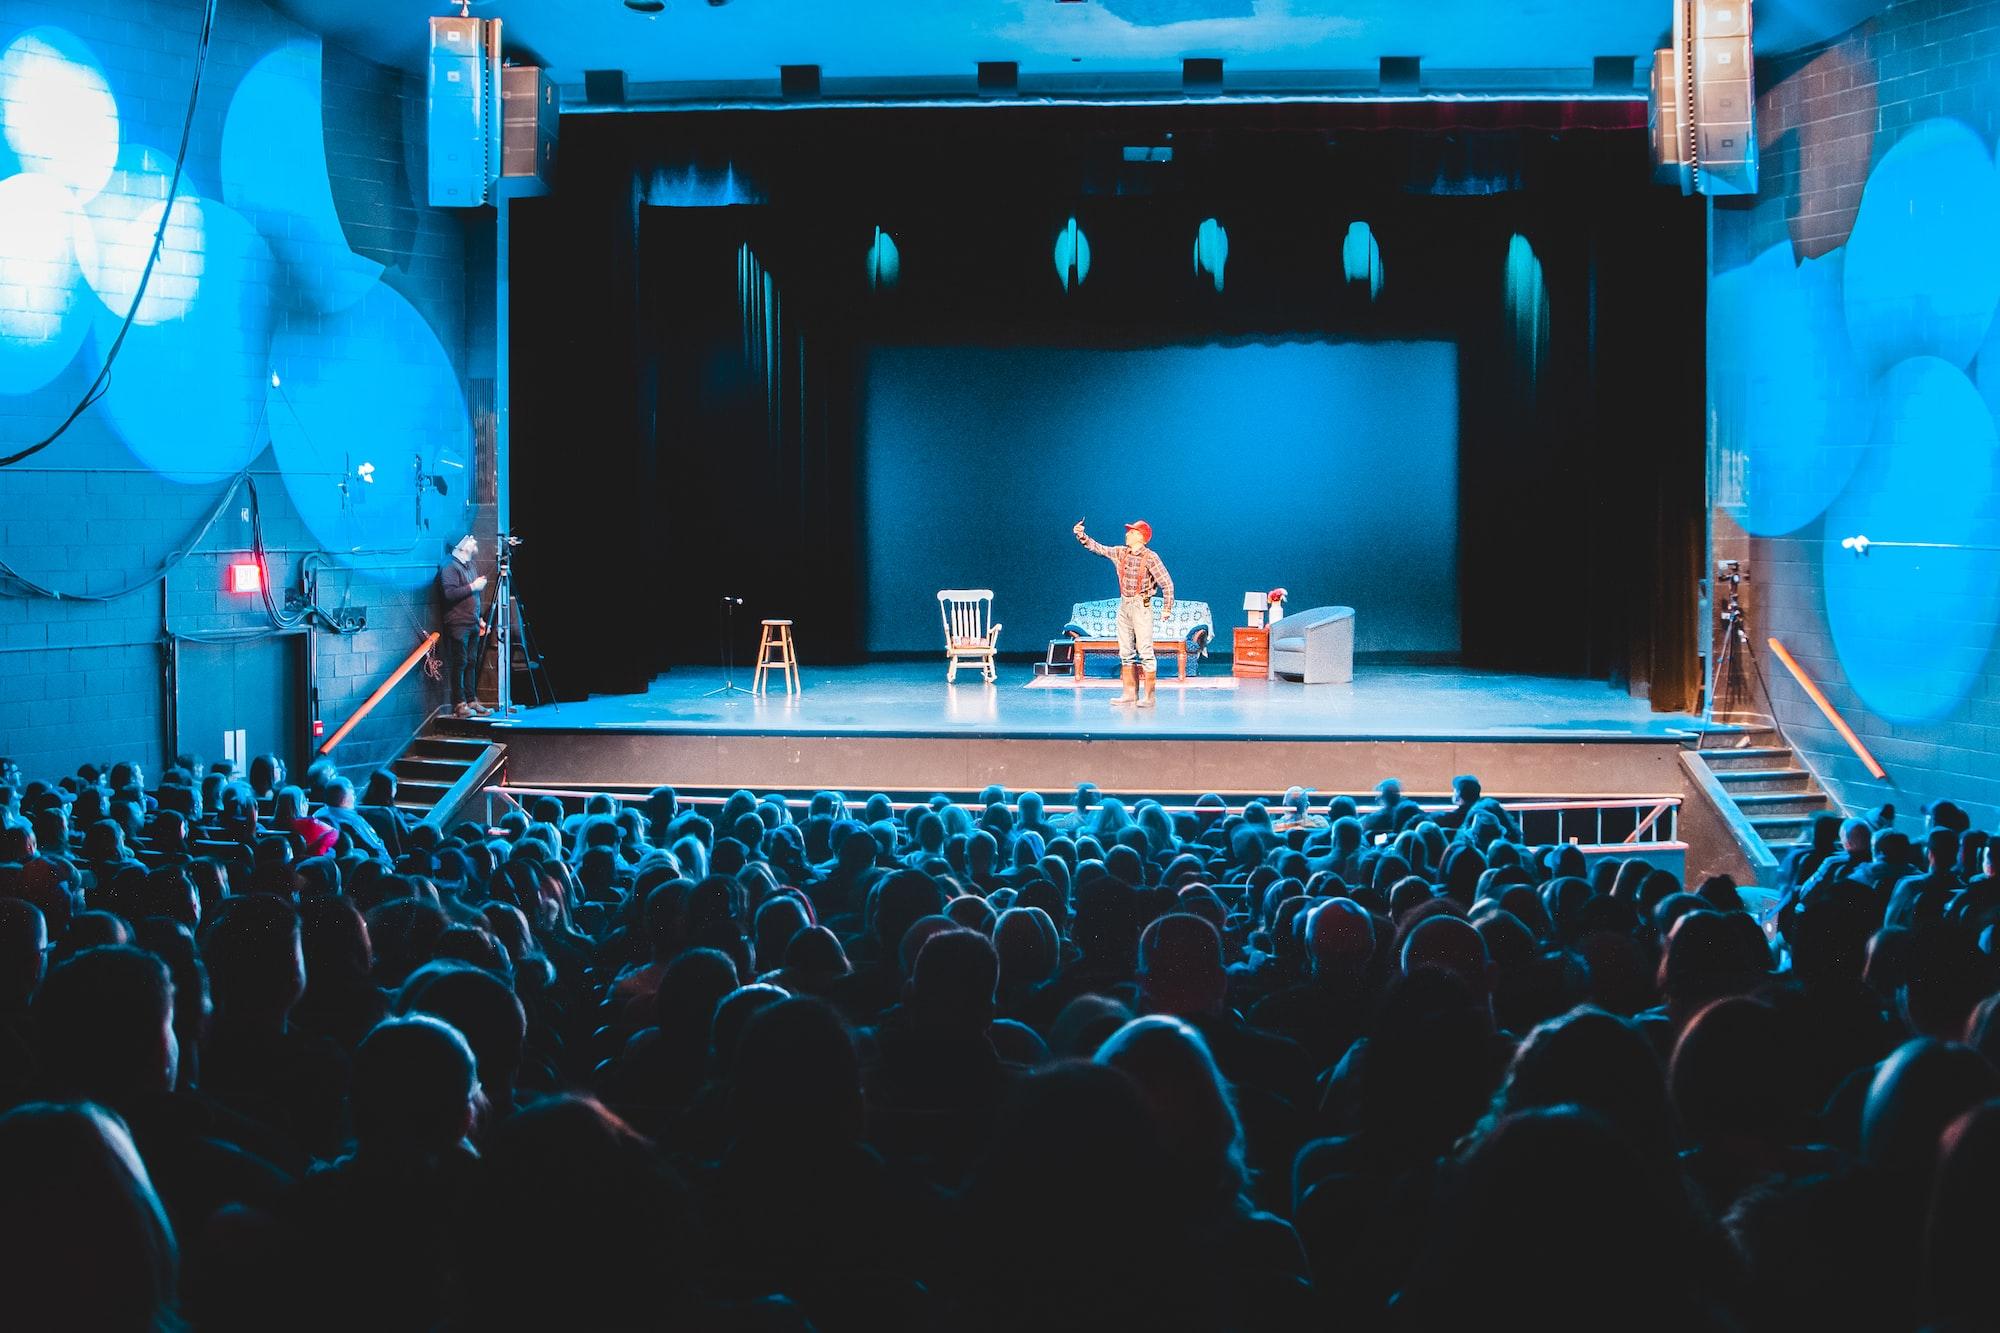 Week 34 - 즉흥 연극 기법으로 AI 챗봇을 학습시킨다면?